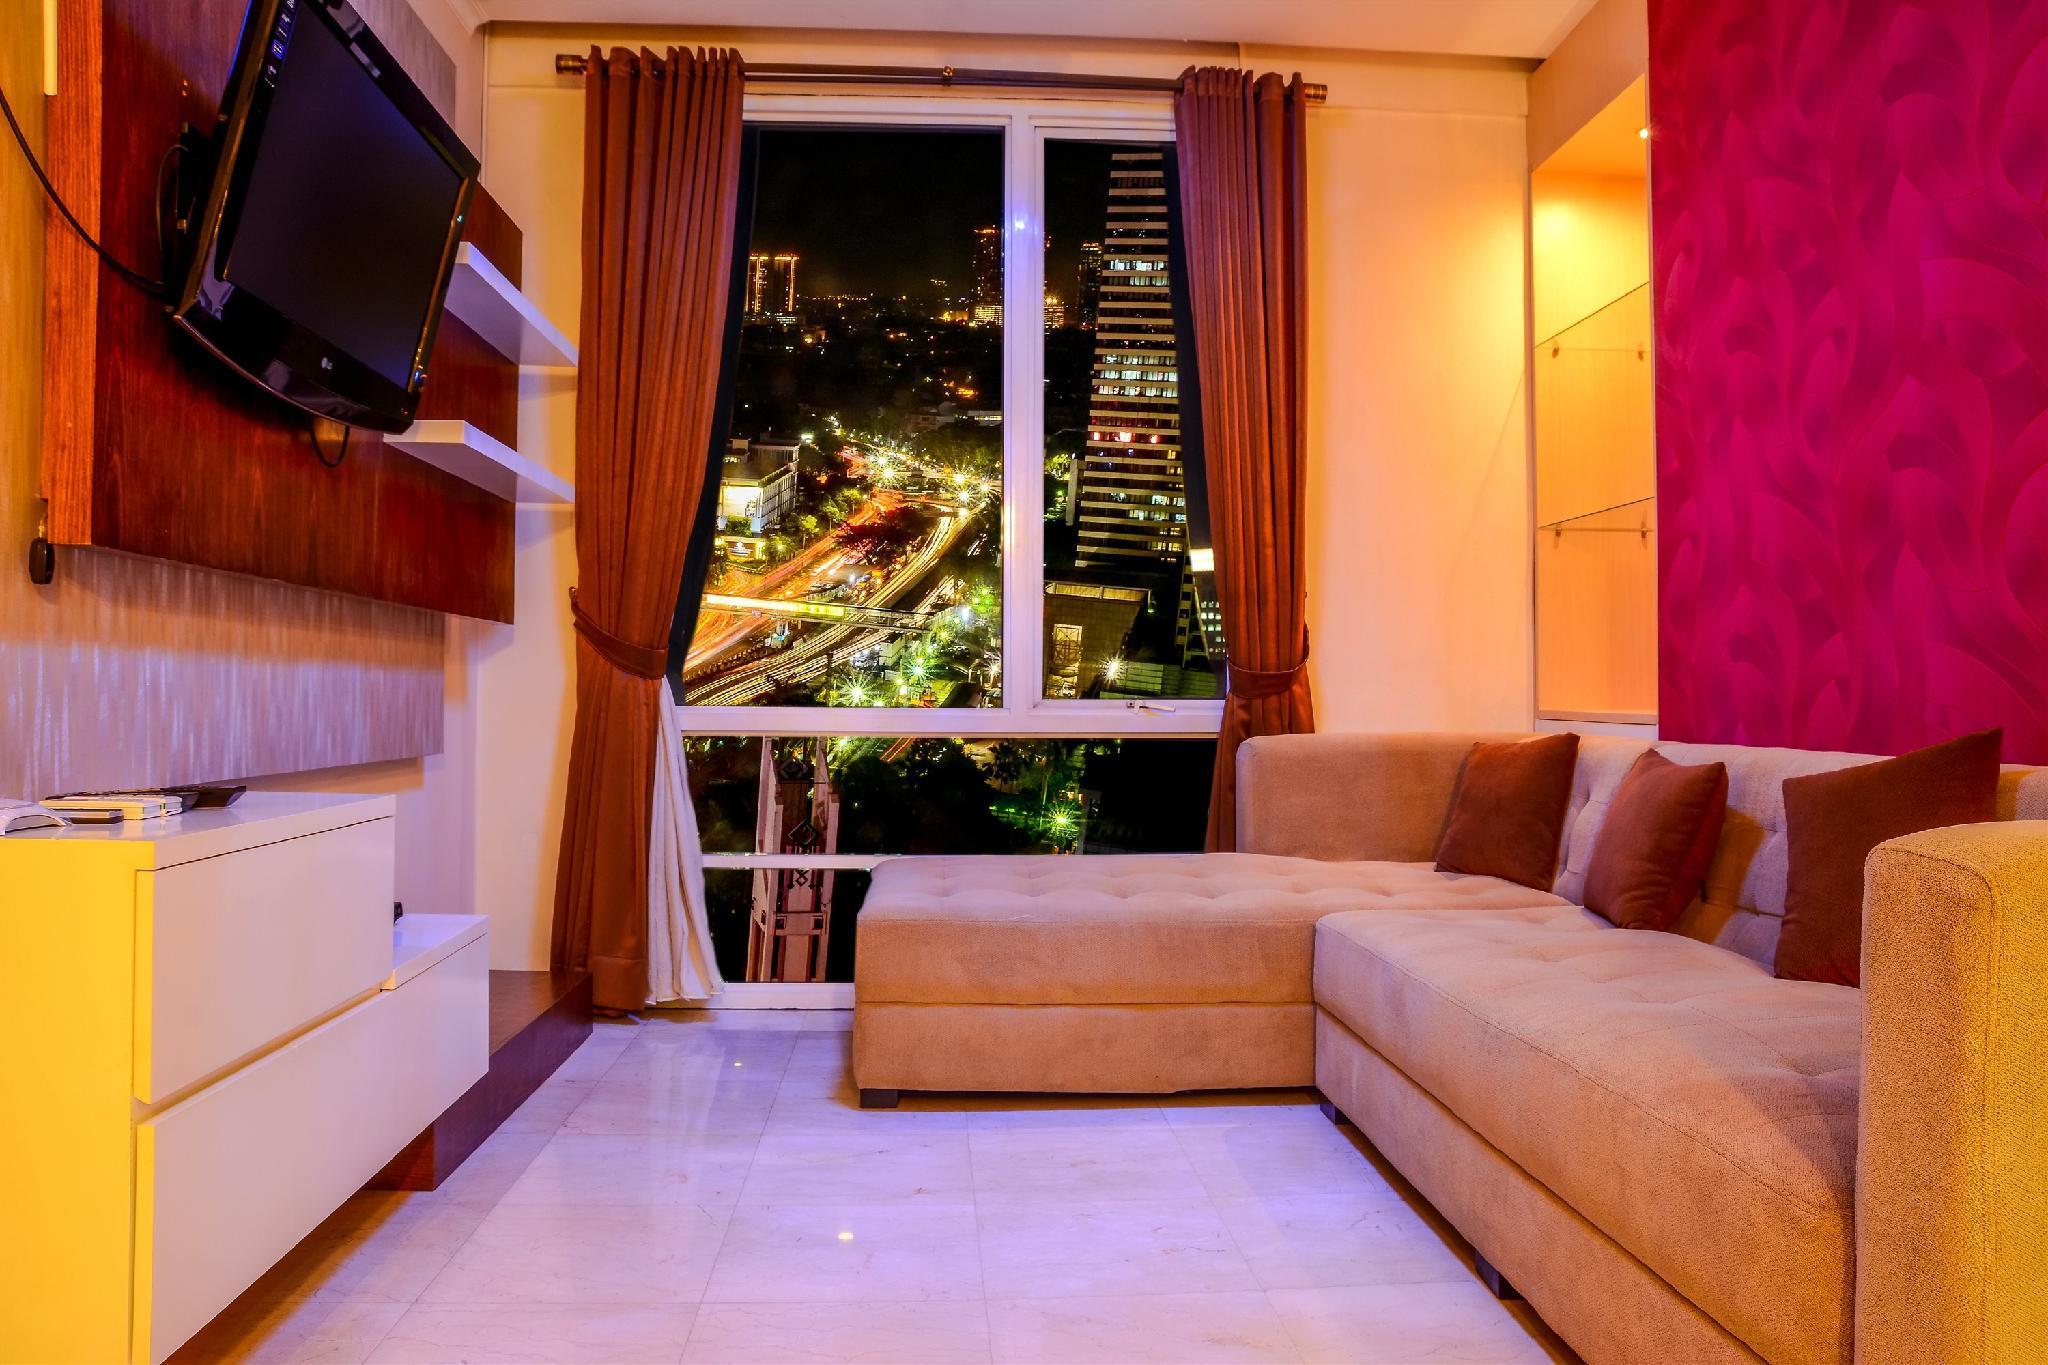 Modern 2BR Apt @ FX Residence By Travelio